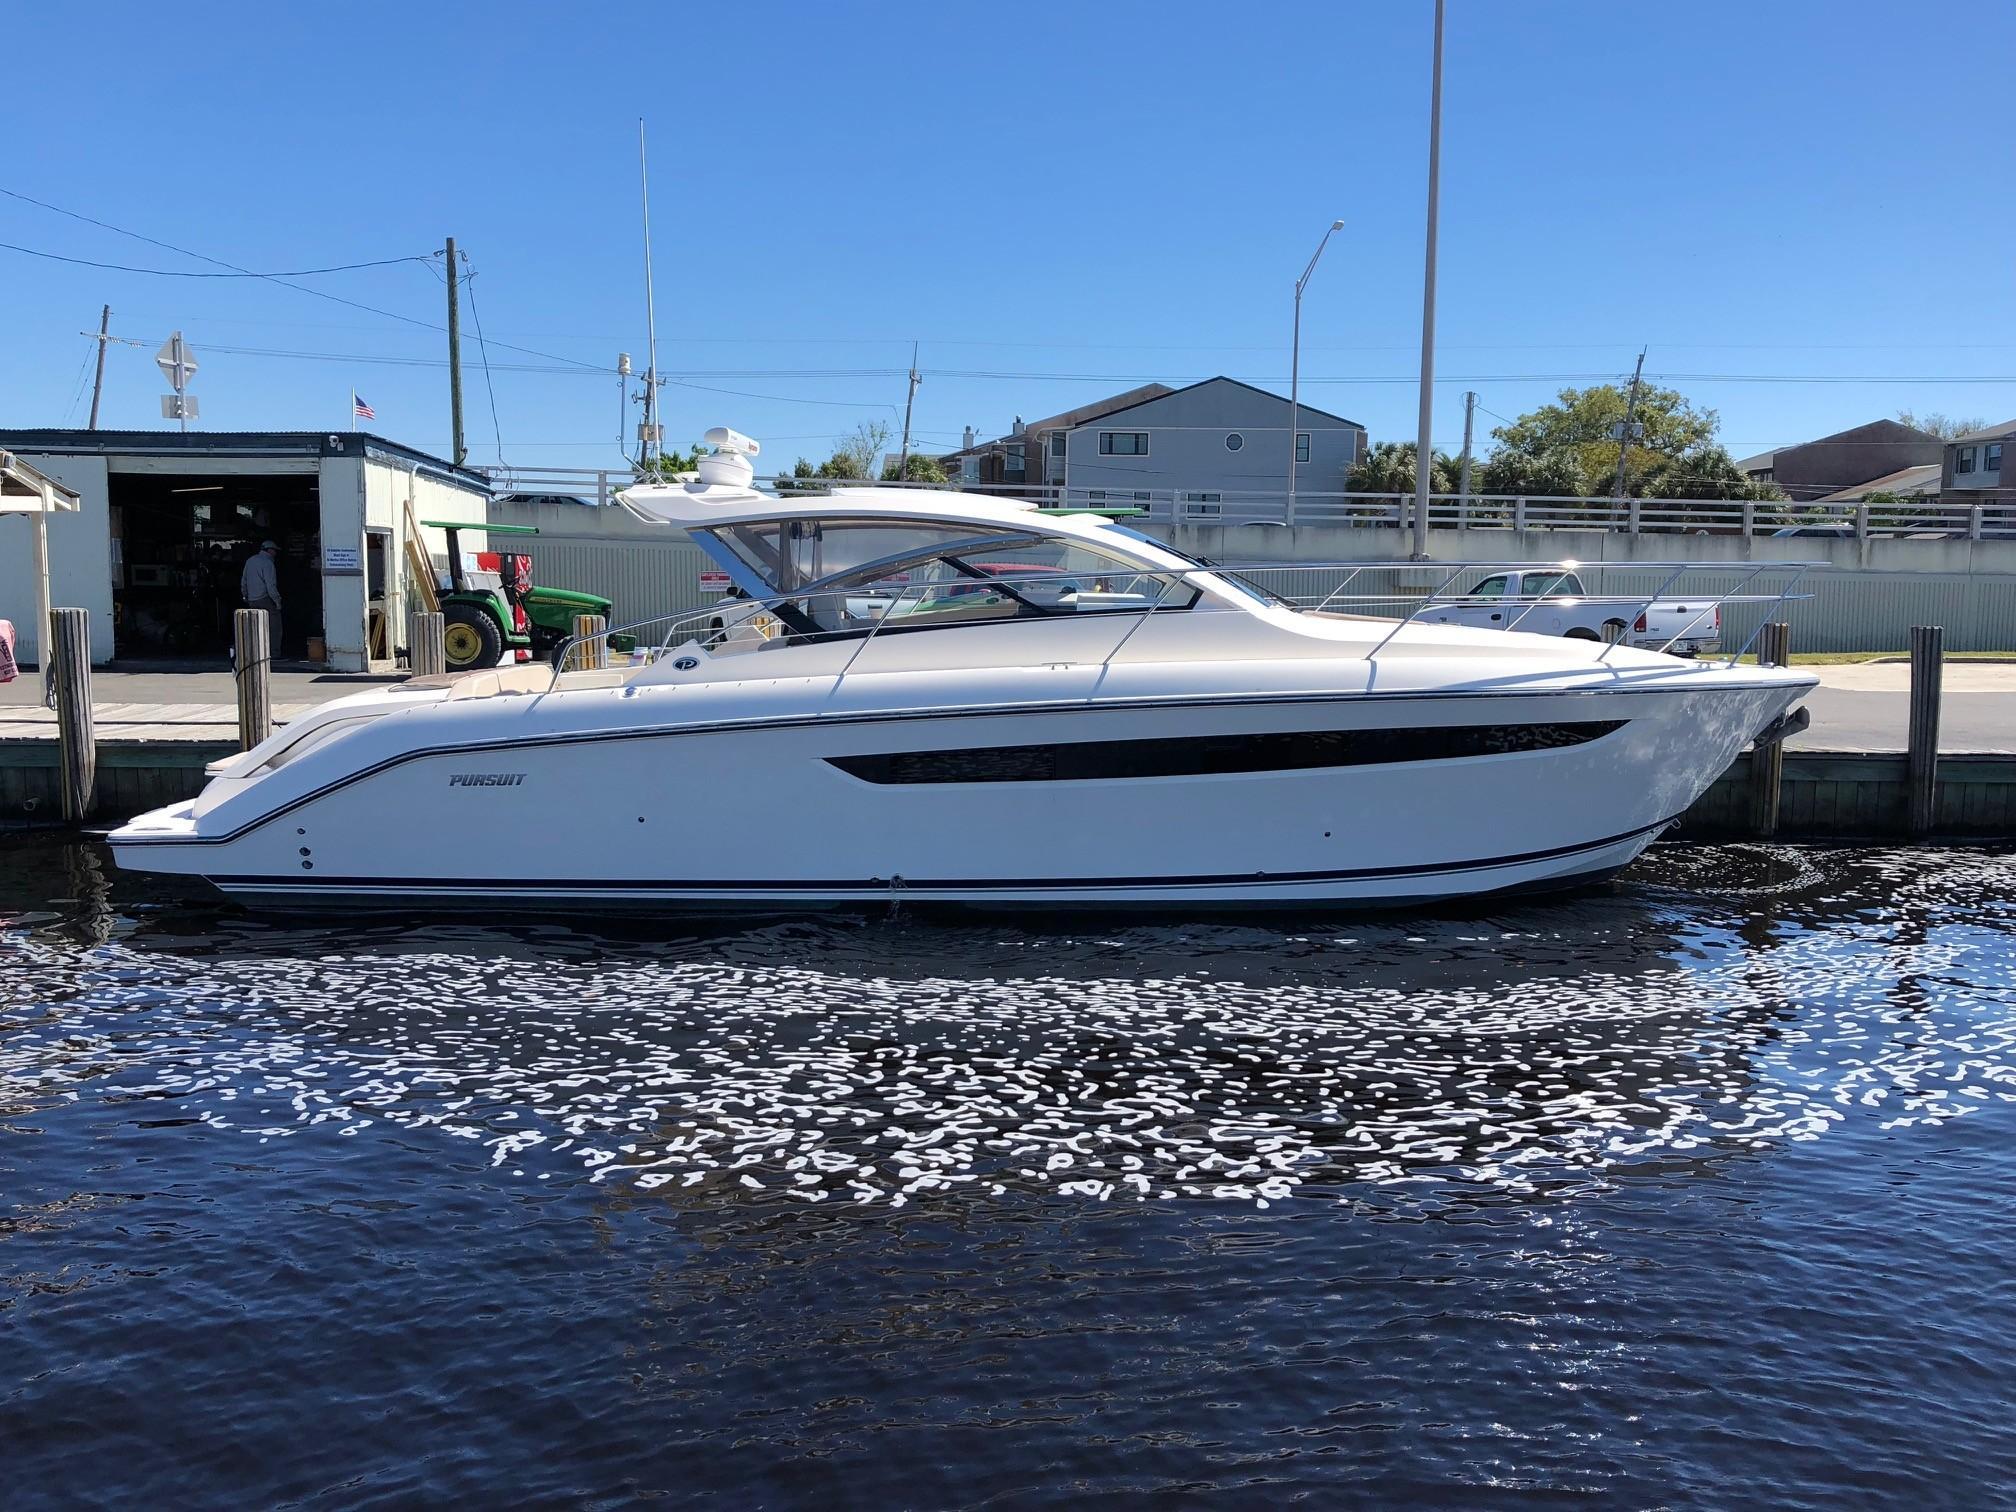 2014 Pursuit Sc 365i Sport Coupe Power Boat For Sale Www Yachtworld Com